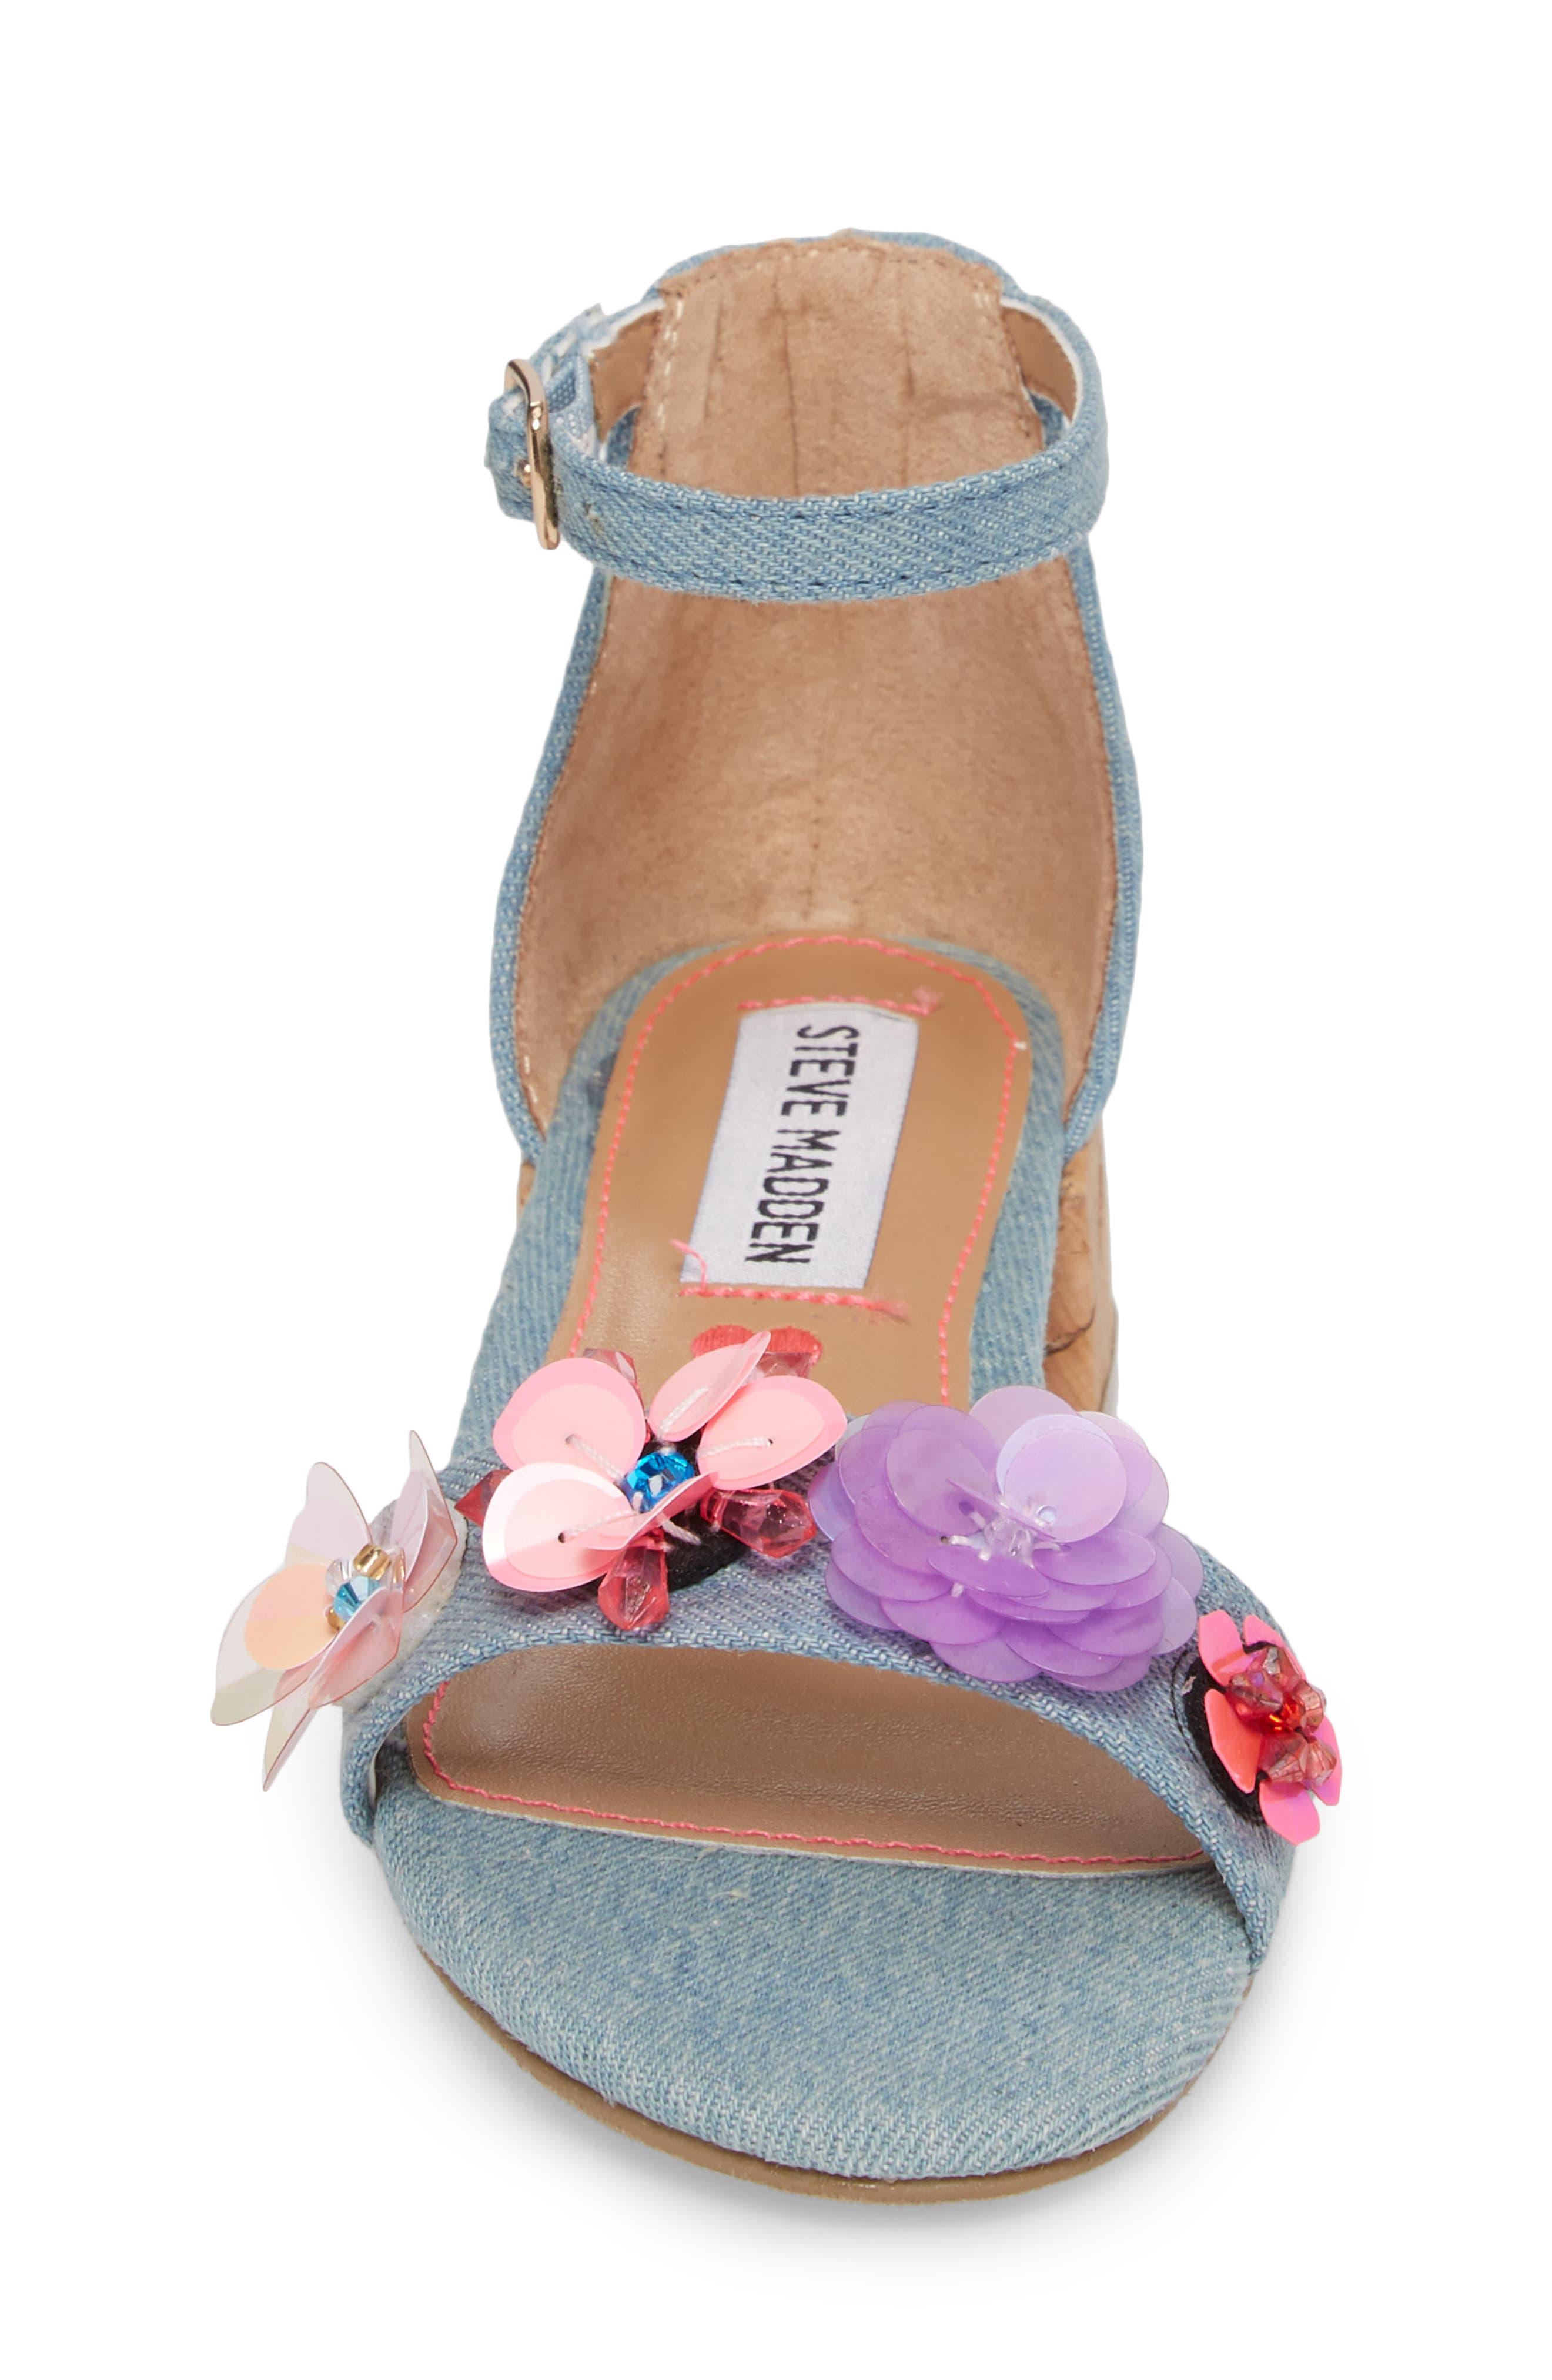 Iriss Embellished Flower Sandal,                             Alternate thumbnail 4, color,                             400